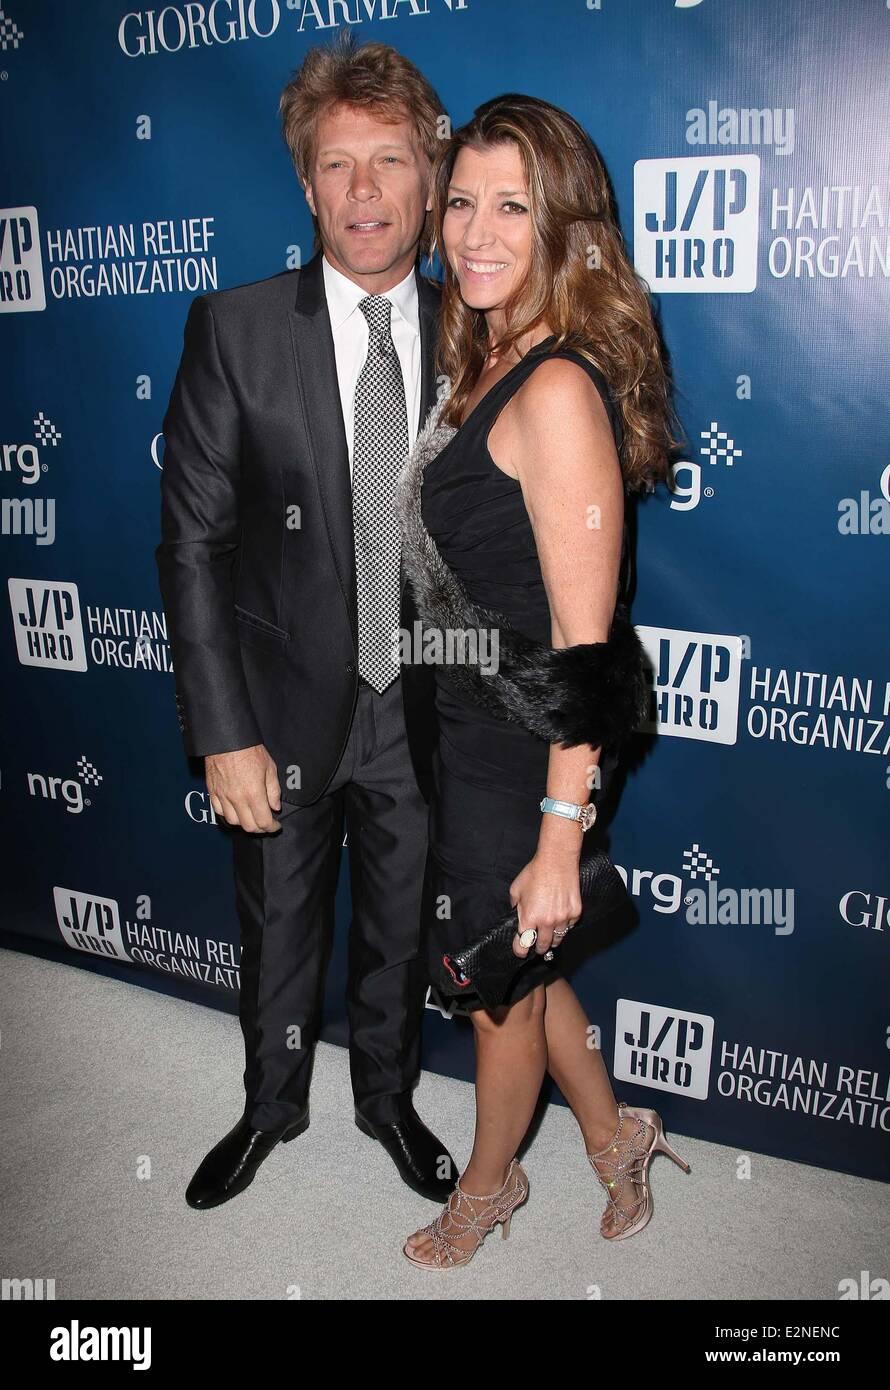 2nd Annual Sean Penn and Friends Help Haiti Home Gala benefiting J/P HRO presented by Giorgio Armani - Arrivals Featuring: Jon Bon Jovi,Dorothea Hurley ...